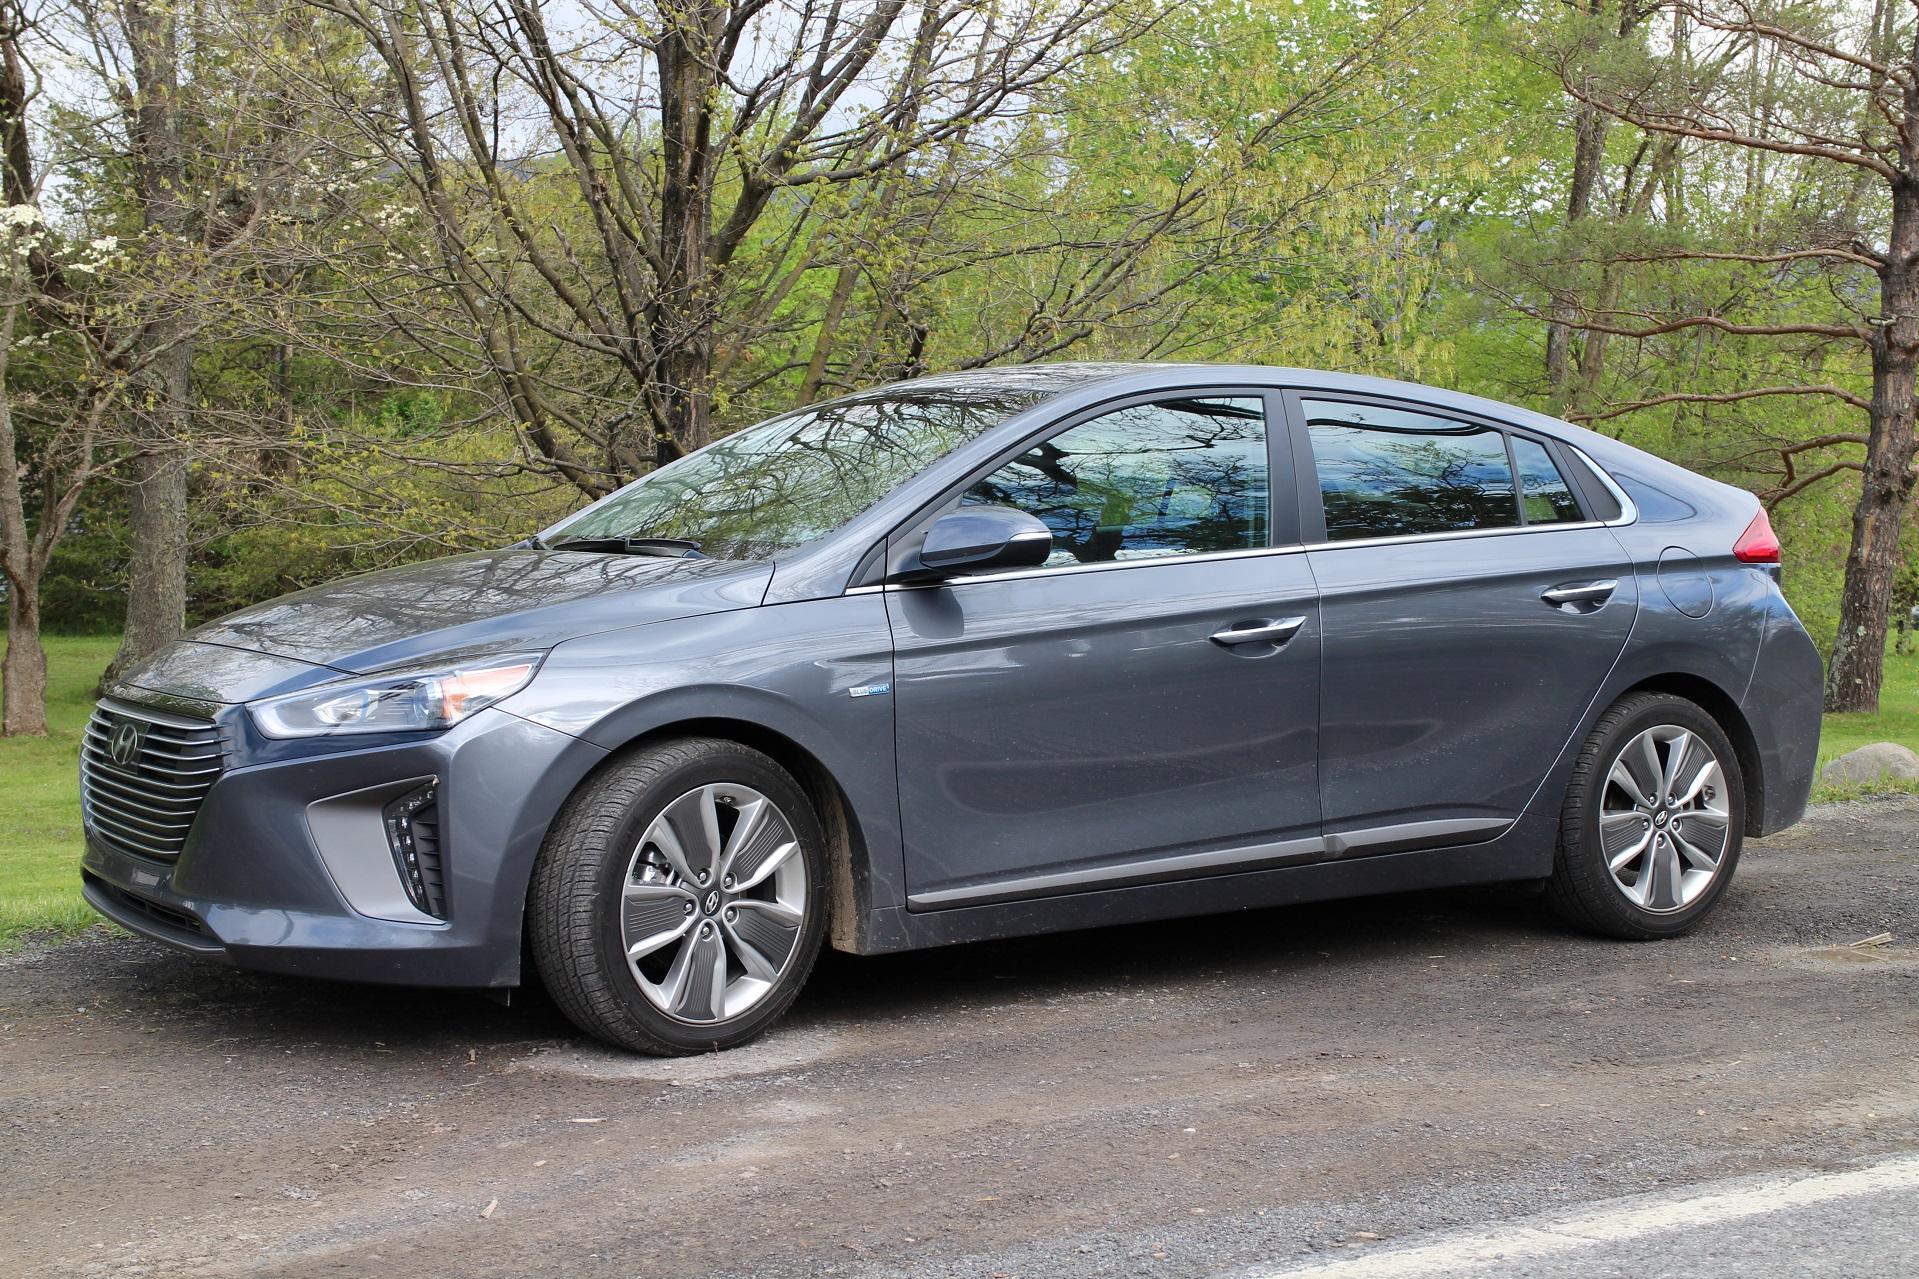 2017 Hyundai Ioniq Hybrid Gas Mileage Review